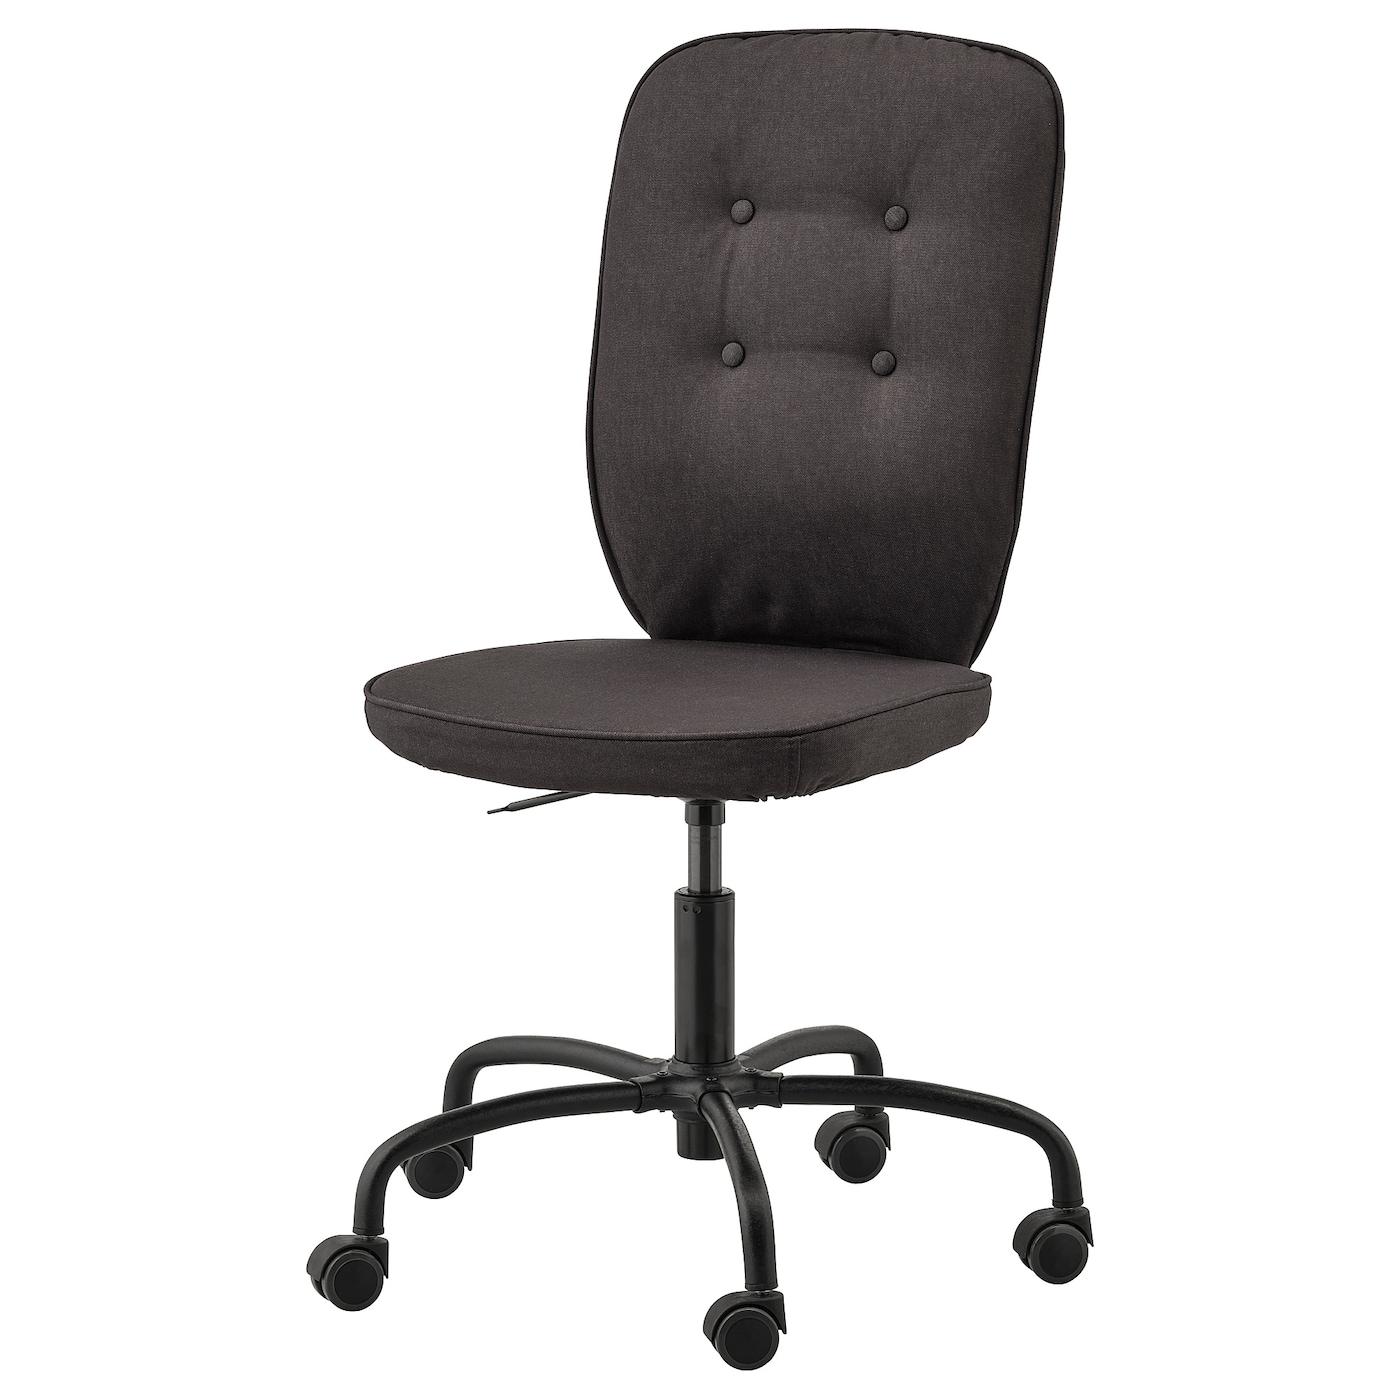 LILLHÖJDEN Swivel chair - Idemo black - IKEA